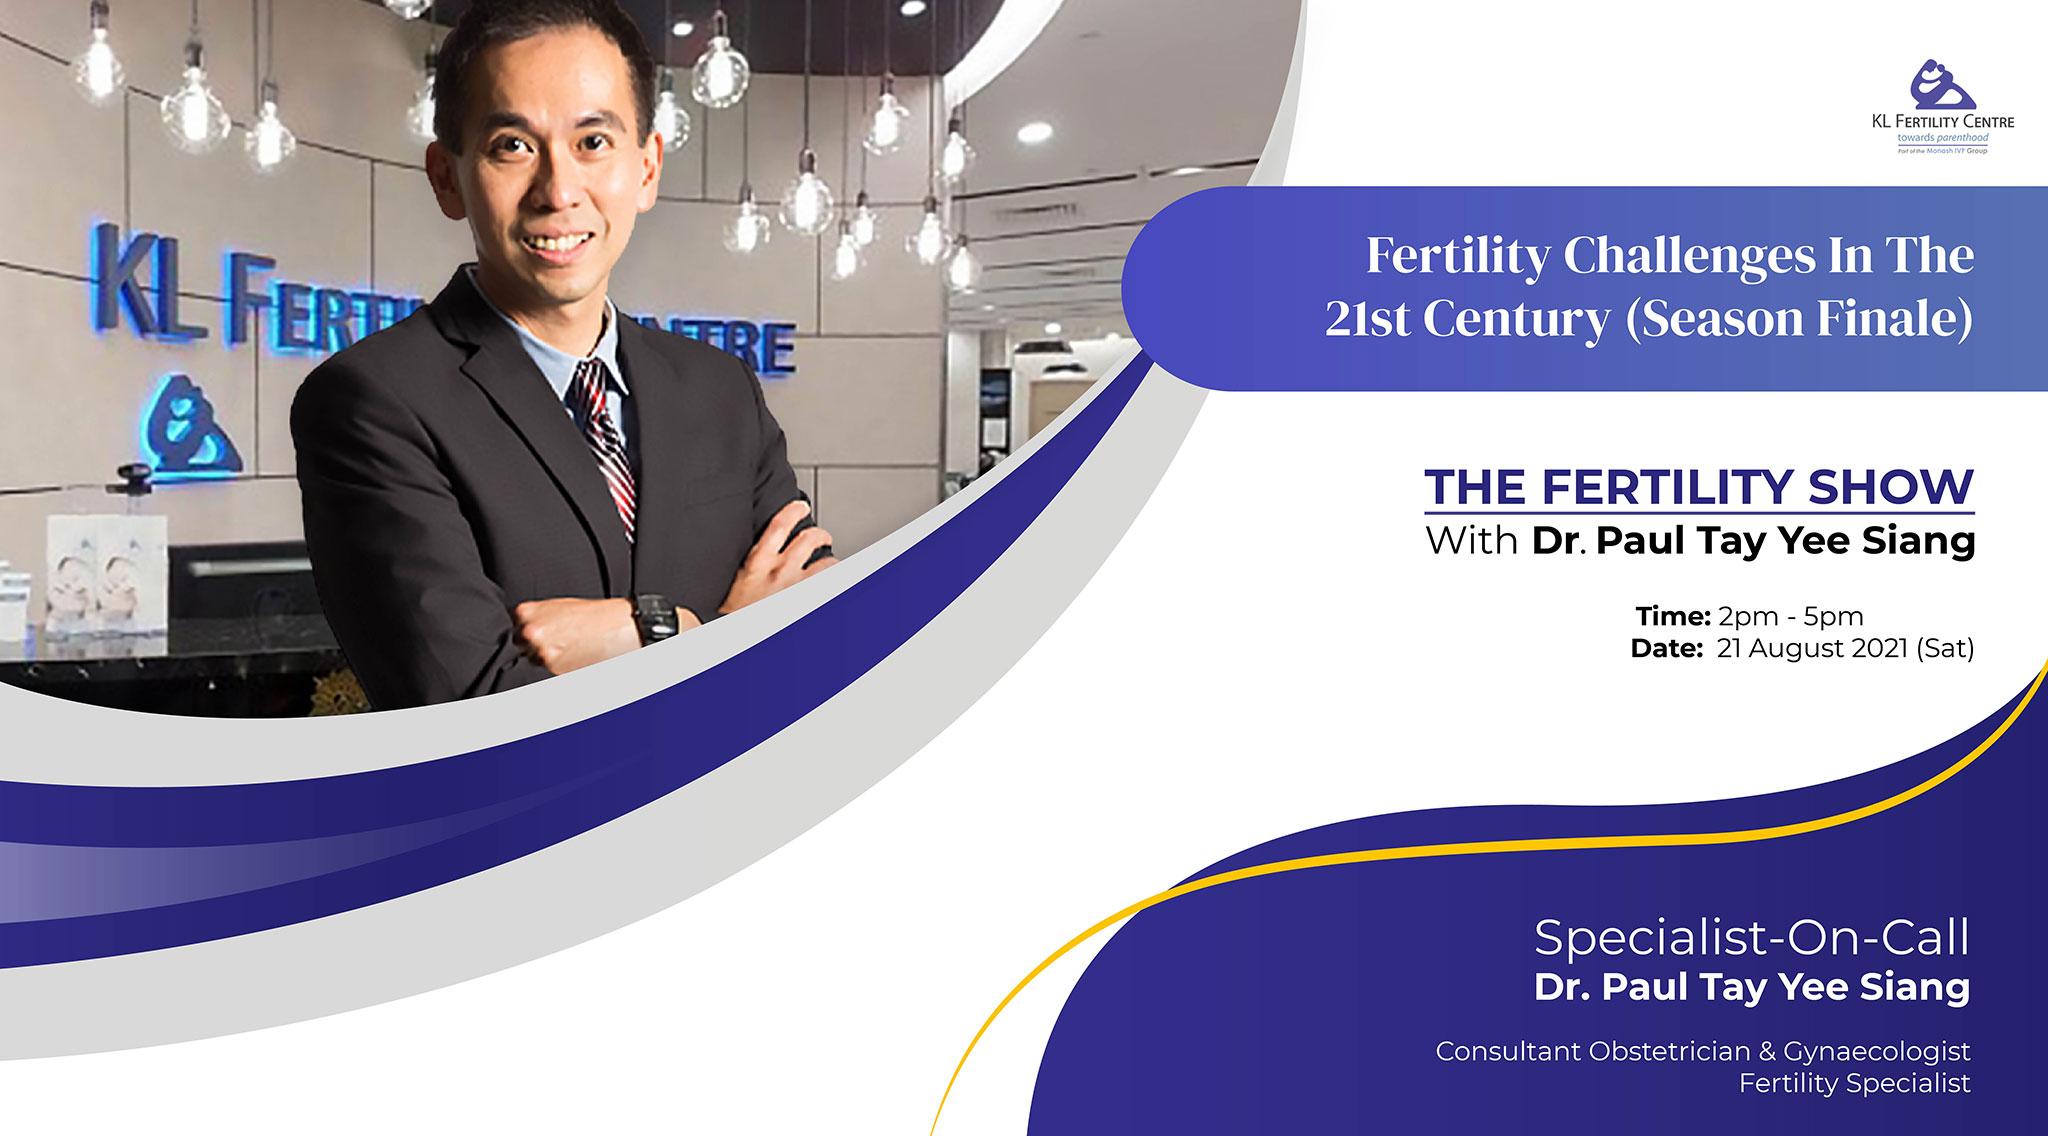 The Fertility Show : Fertility Challenges in The 21st Century (SEASON FINALE) - Dr. Paul Tay